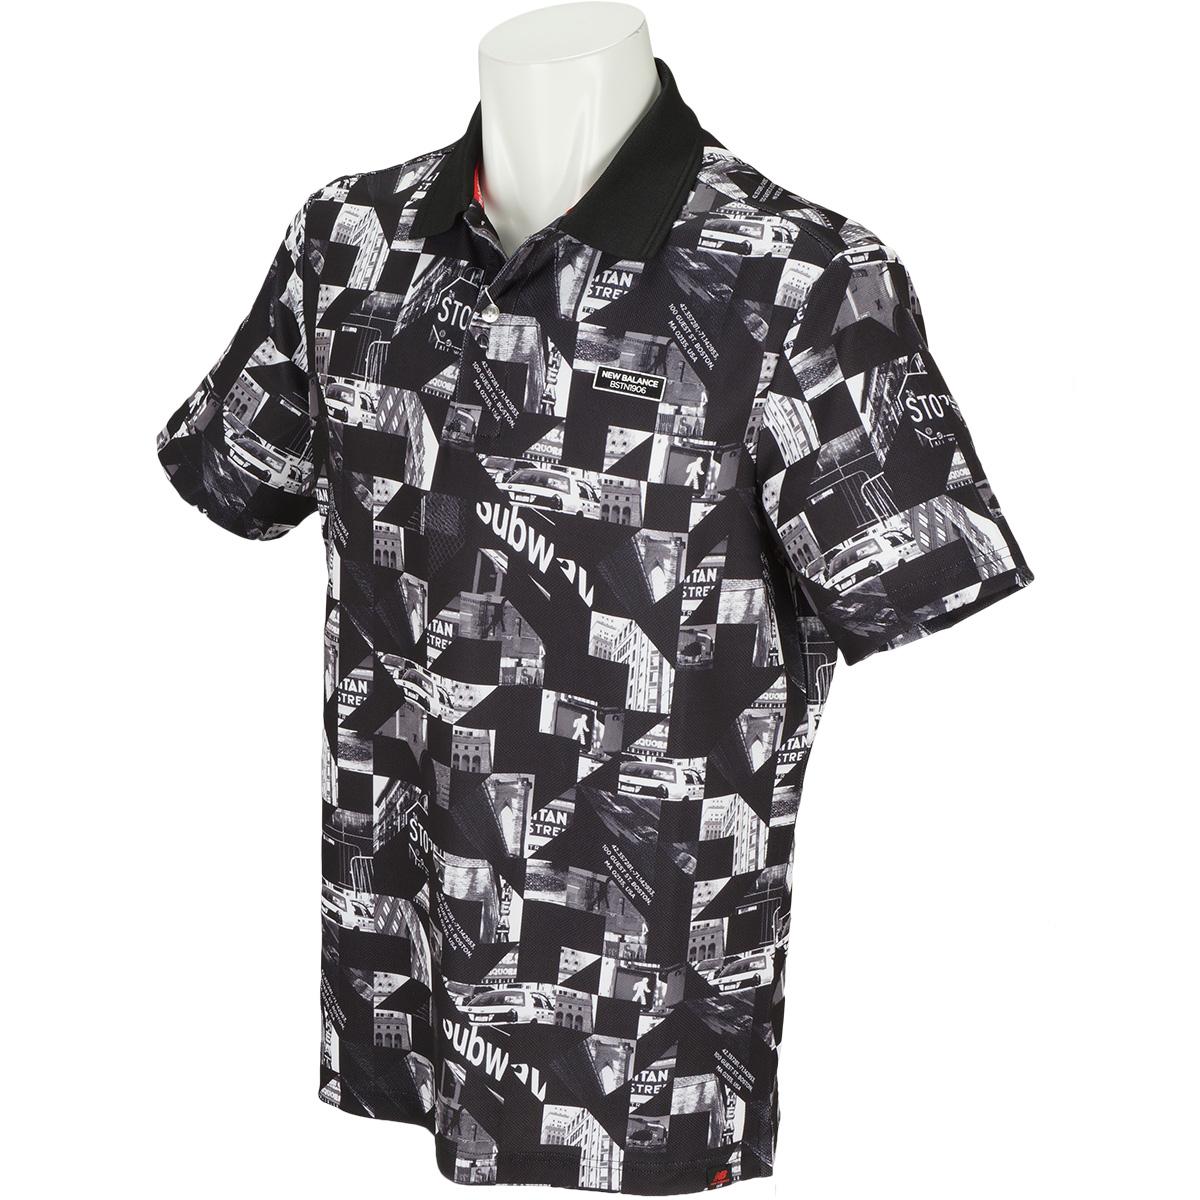 METRO 変形鹿の子 フォトモンタジュープリント半袖ポロシャツ